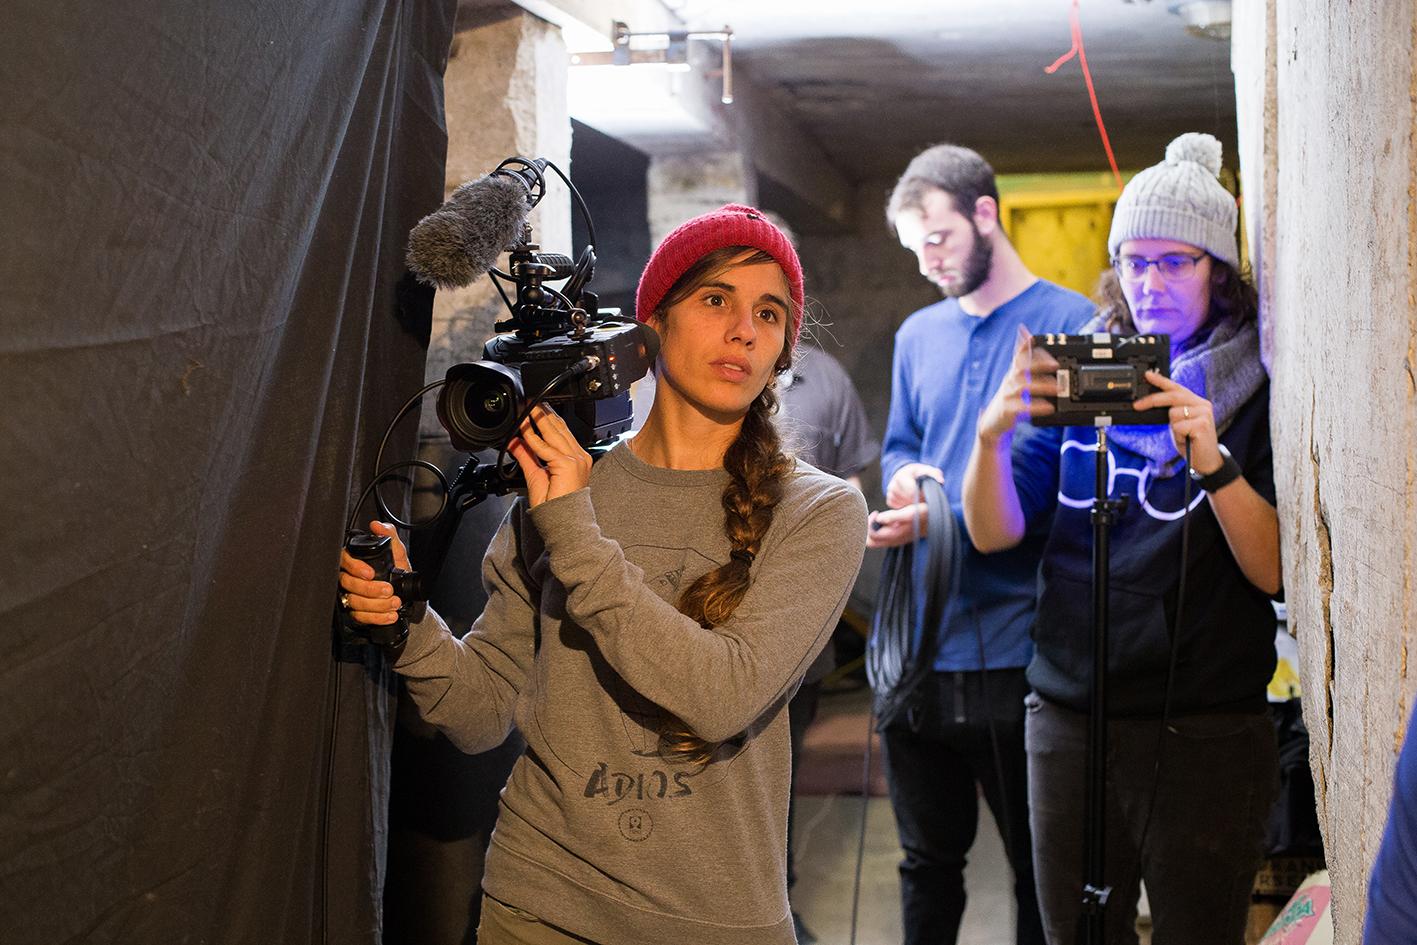 Director of photography, Sara Guix and Wintec Alumni David Tharratt (camera assist) prepare to reposition the camera in Blink.